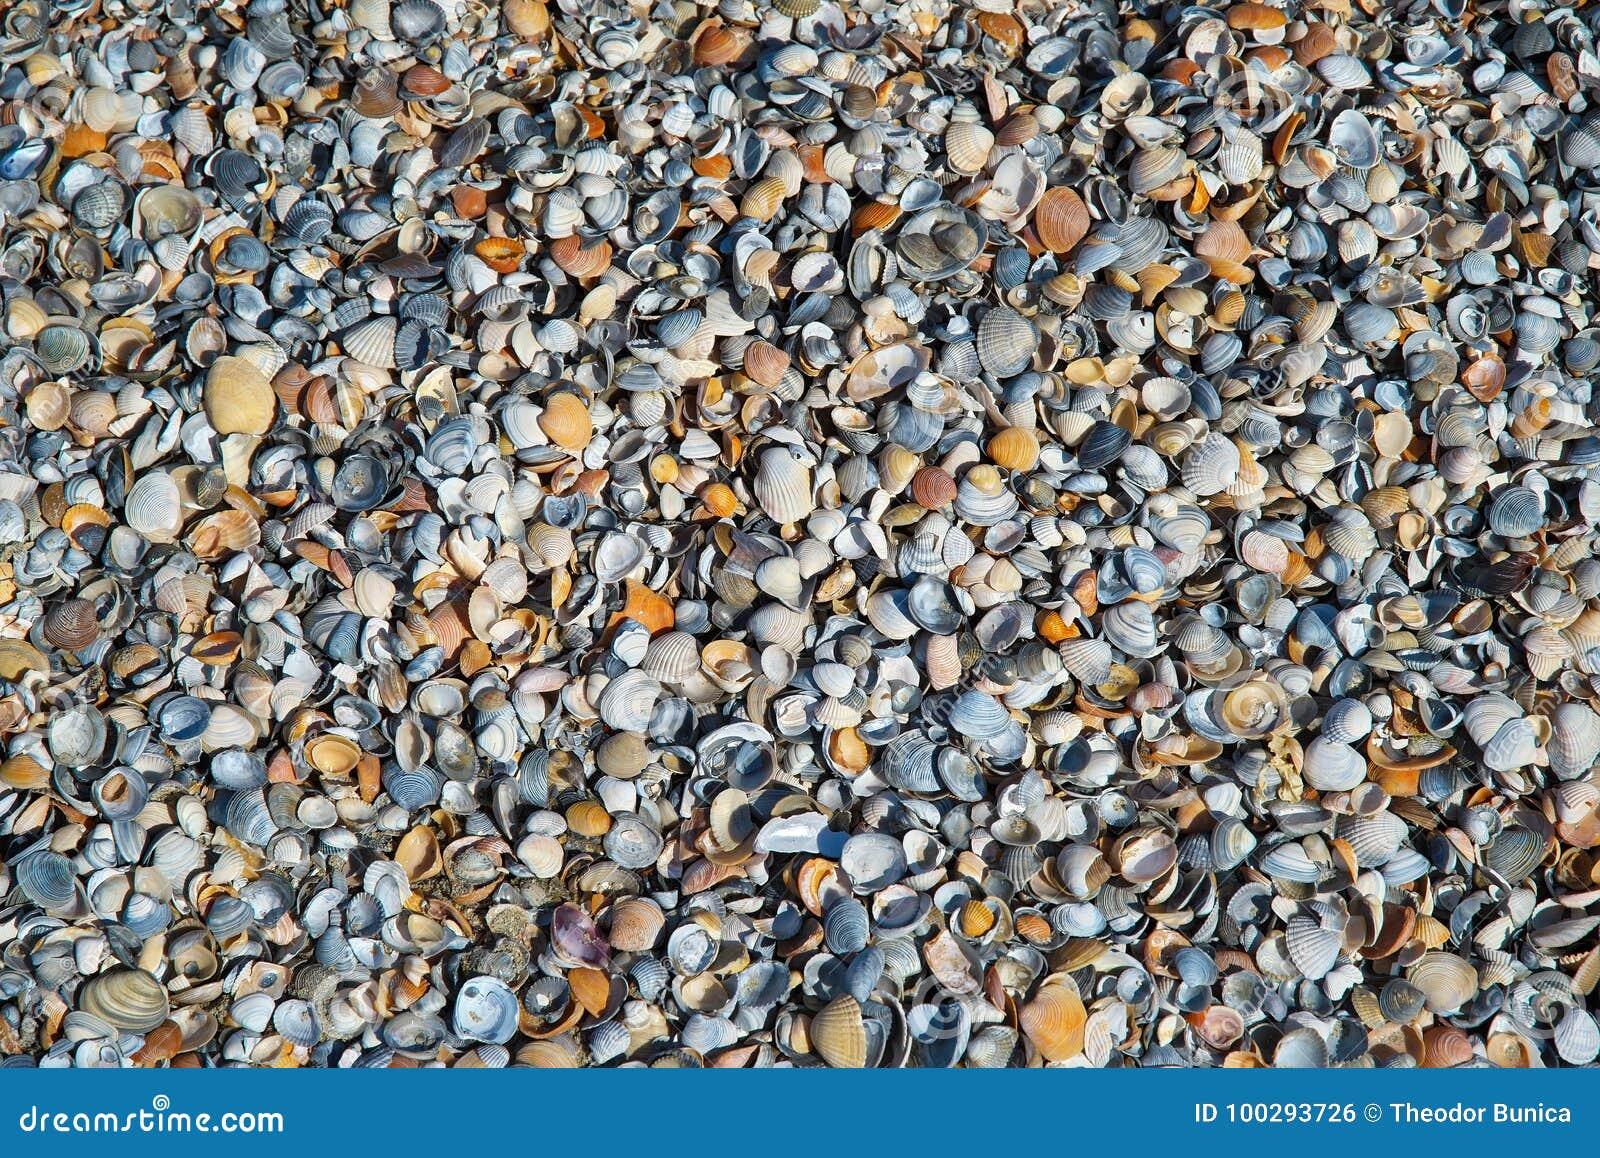 Wallpaper Fundo com shell coloridos